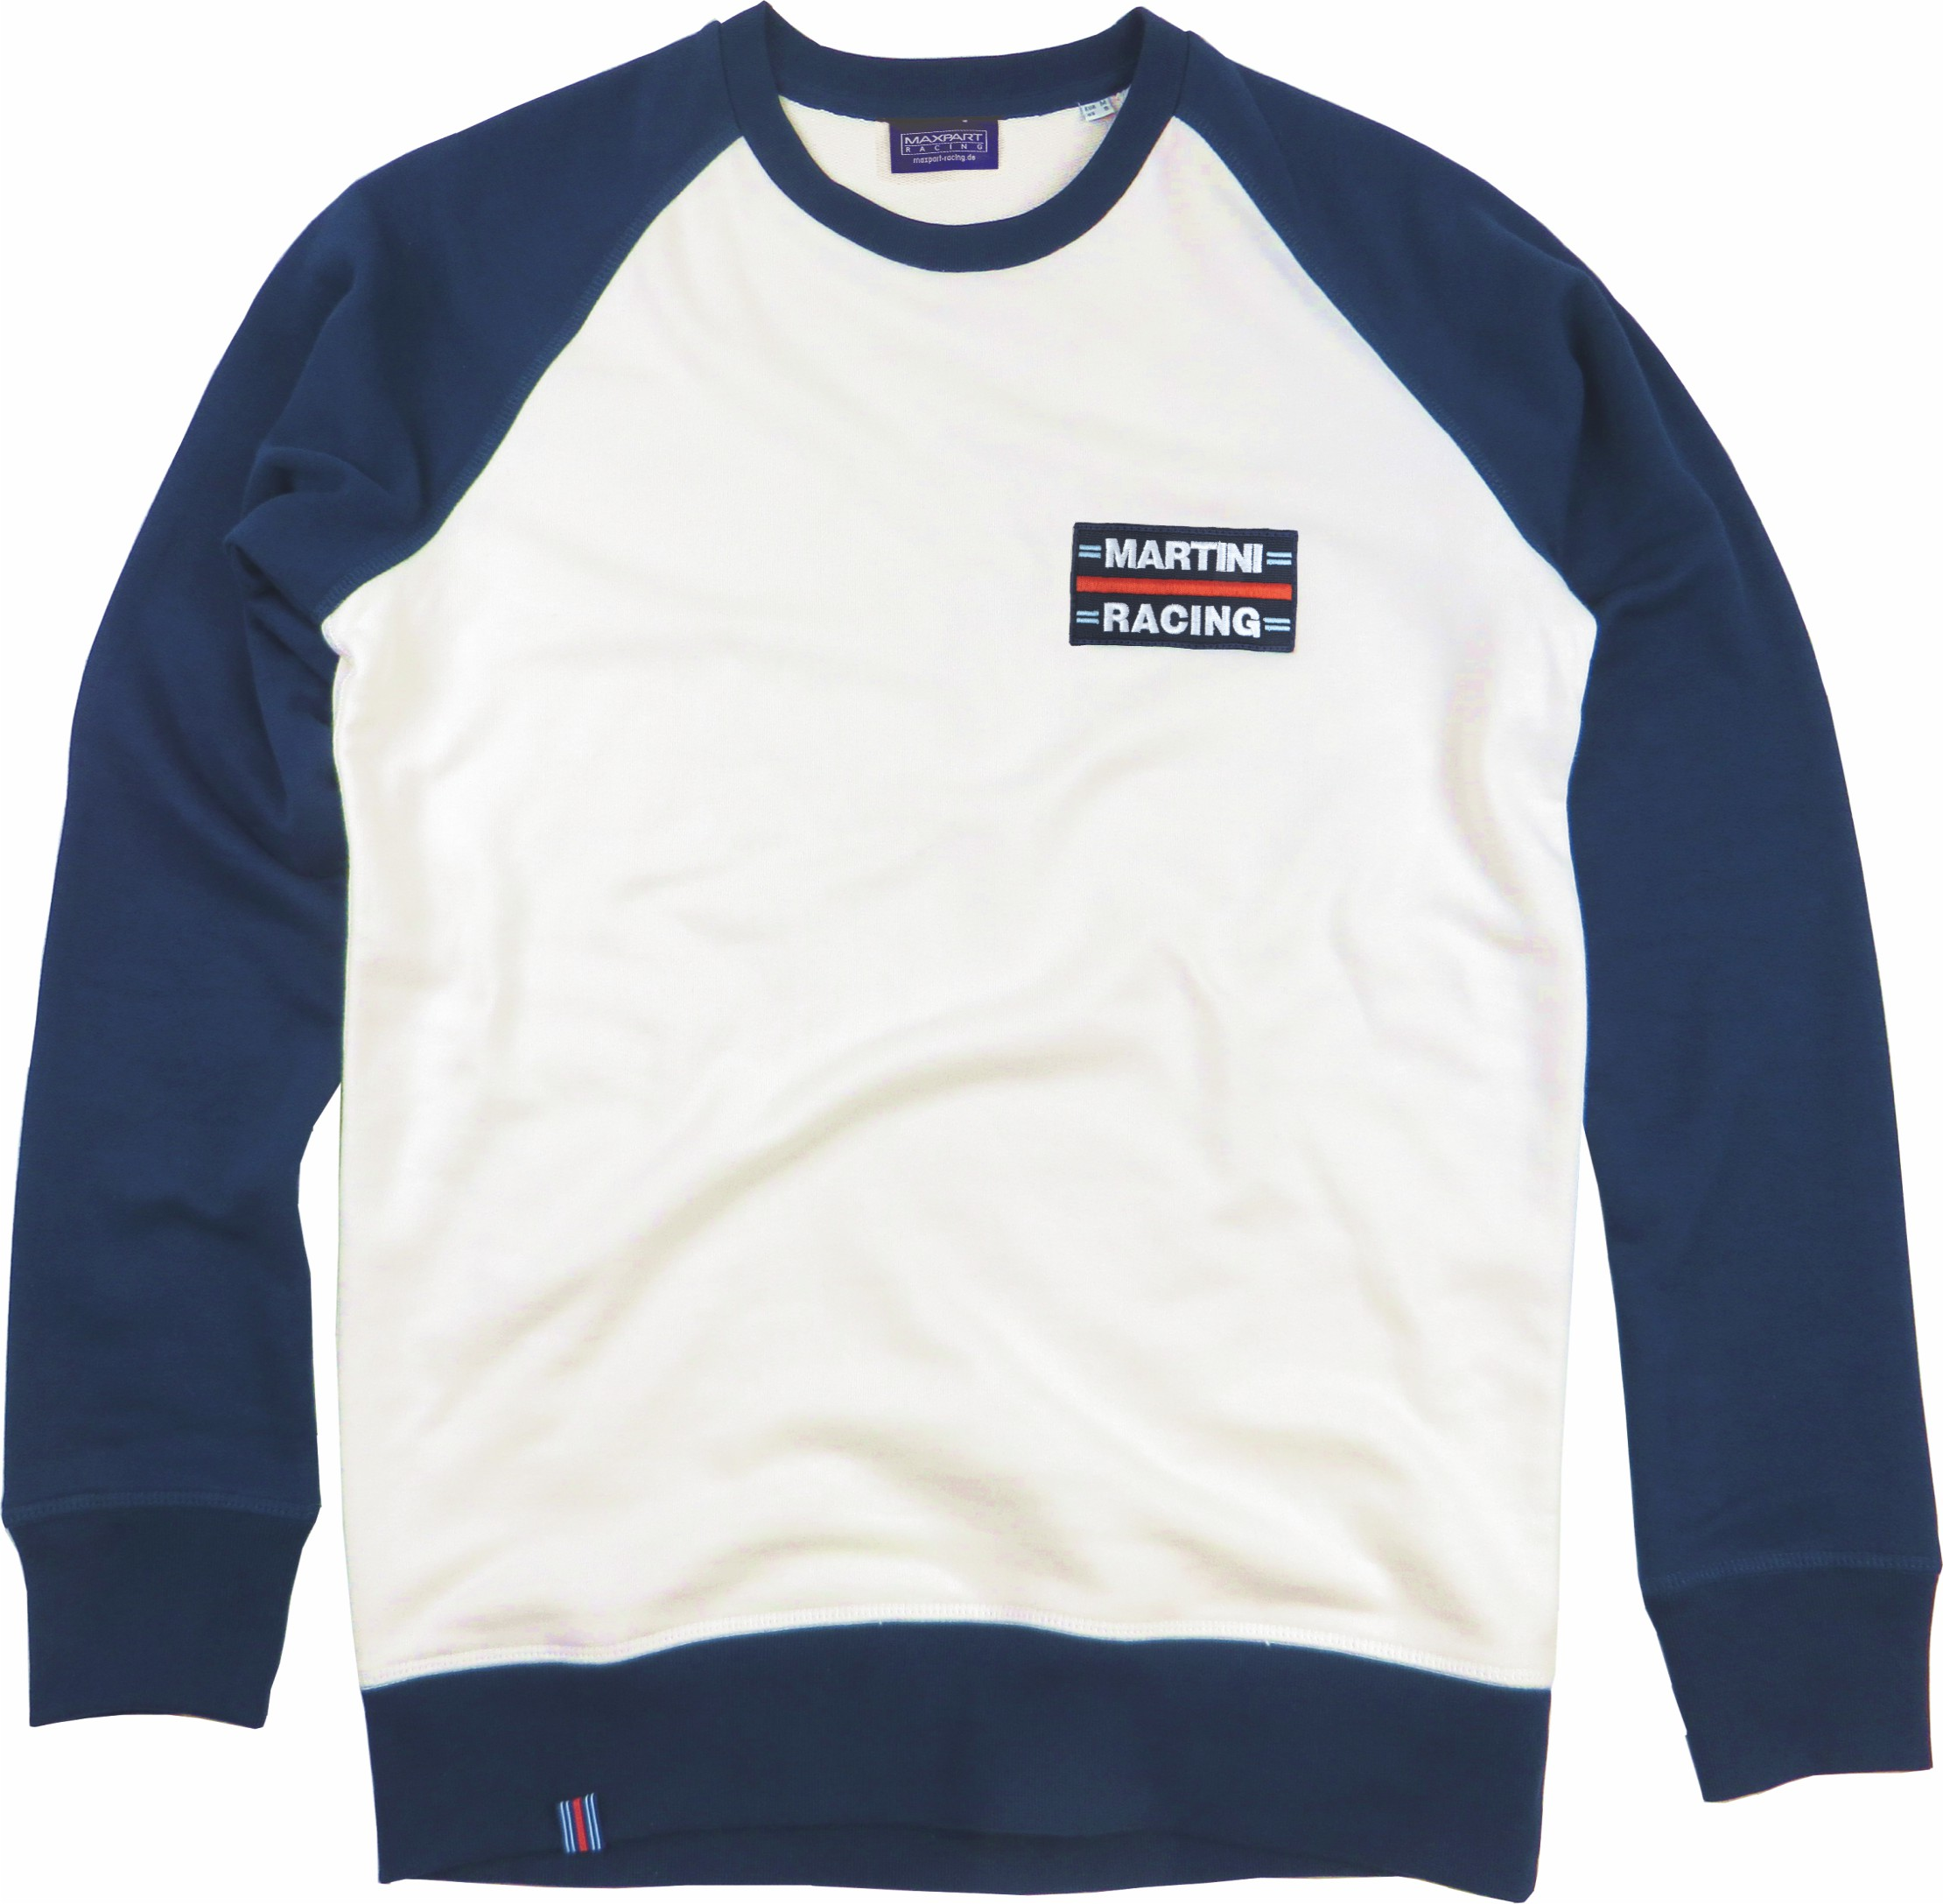 MARTINI RACING Classic Sweatshirt